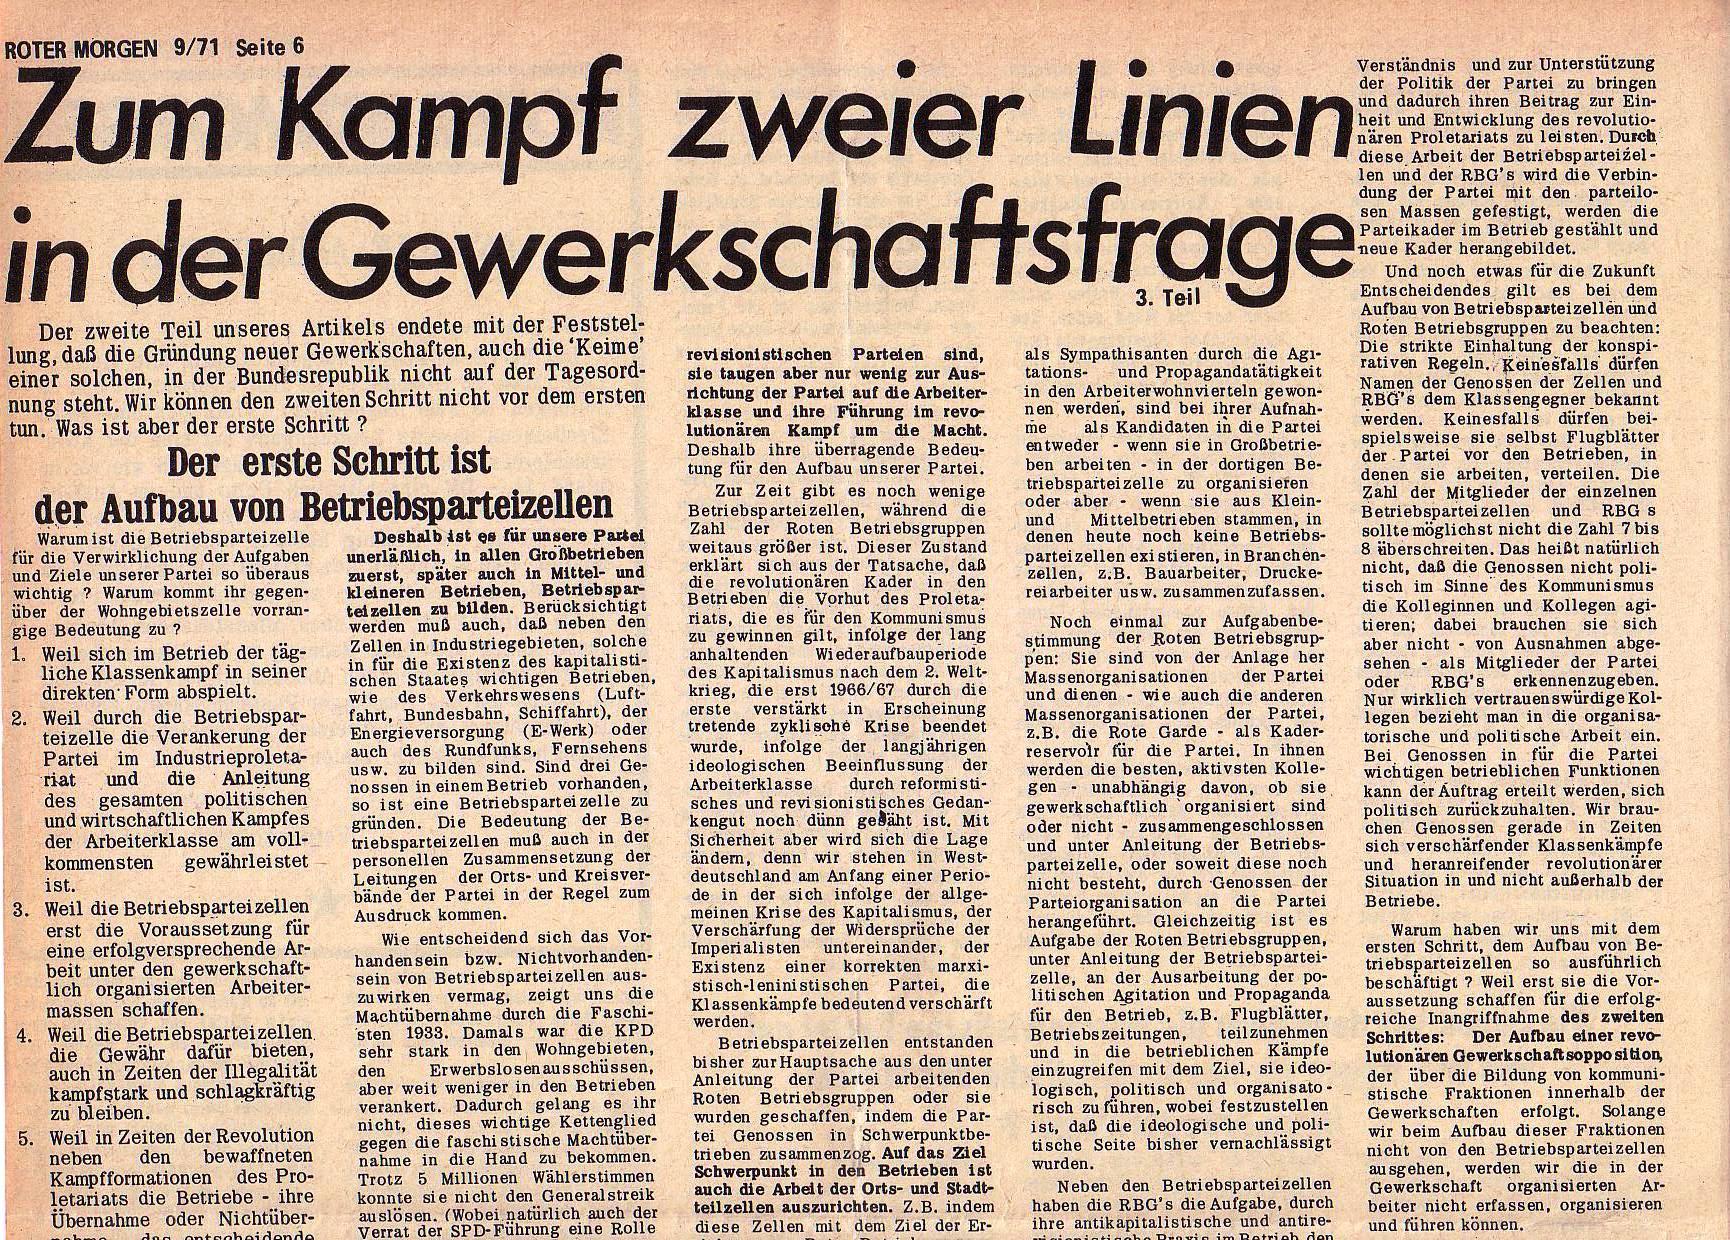 Roter Morgen, 5. Jg., 13. September 1971, Nr. 9, Seite 6a